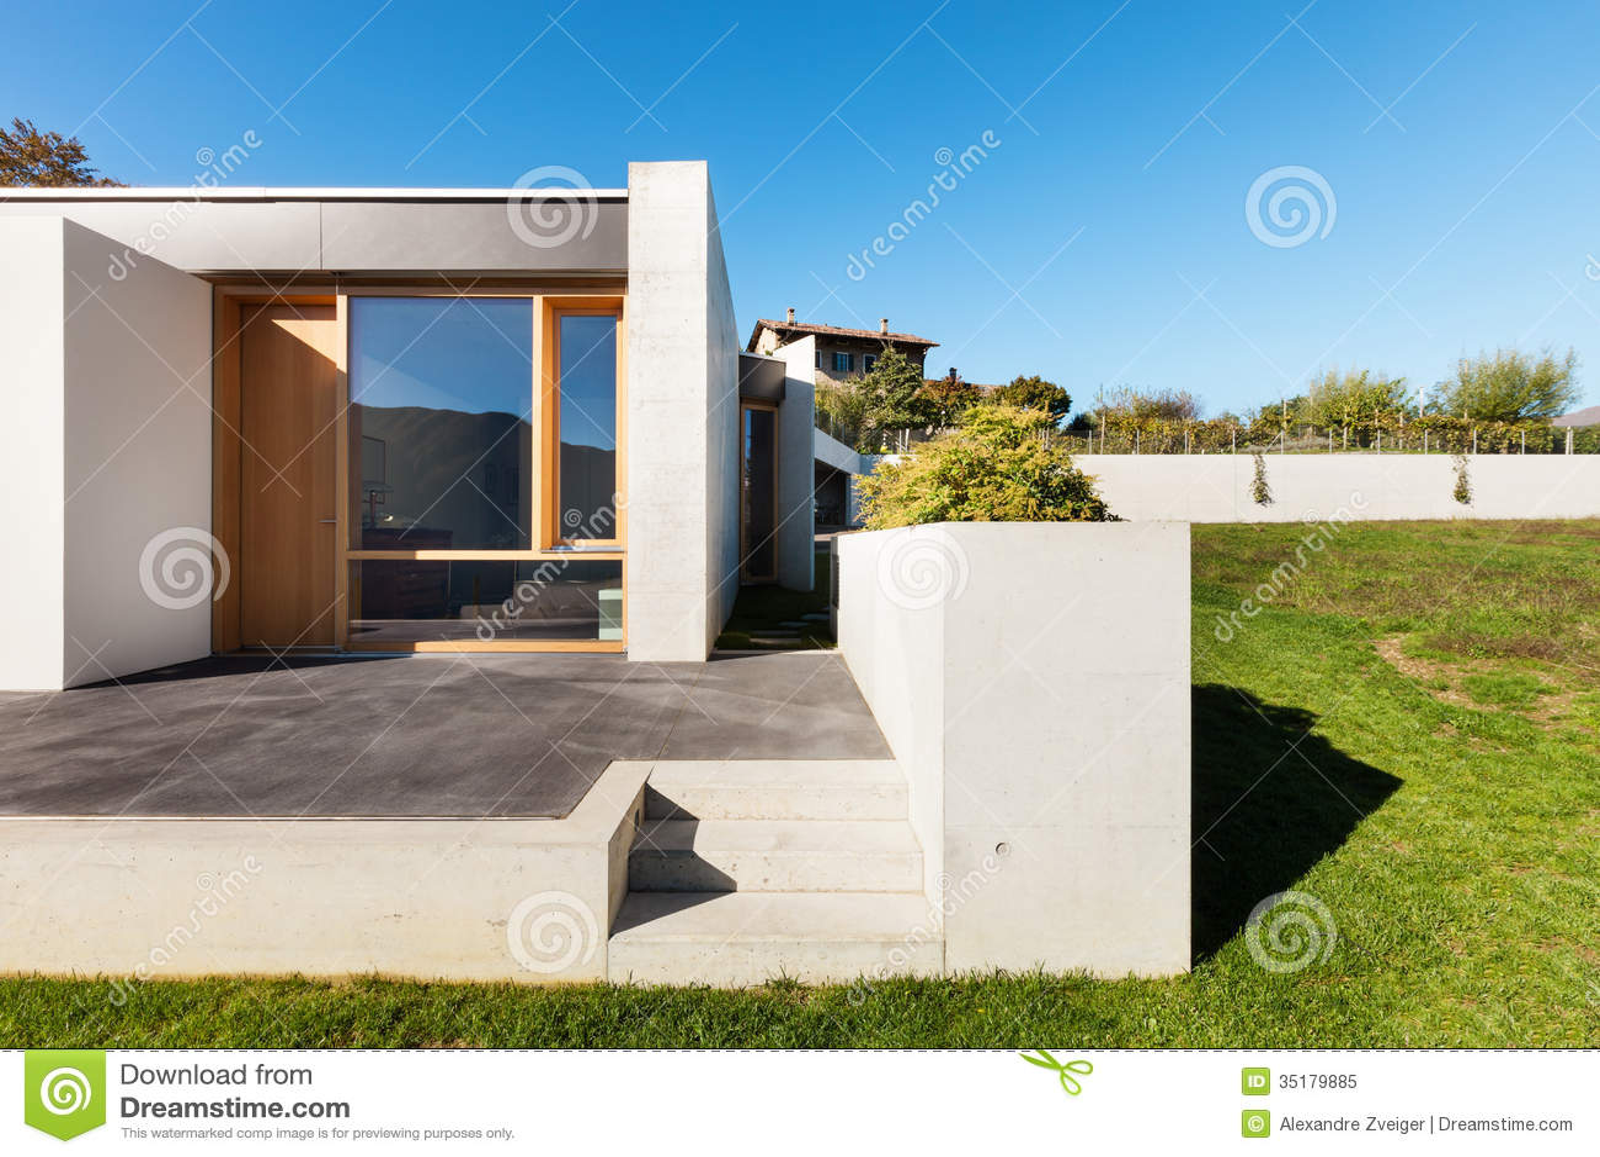 Casa moderna en el cemento foto de archivo libre de for Casa moderna vector